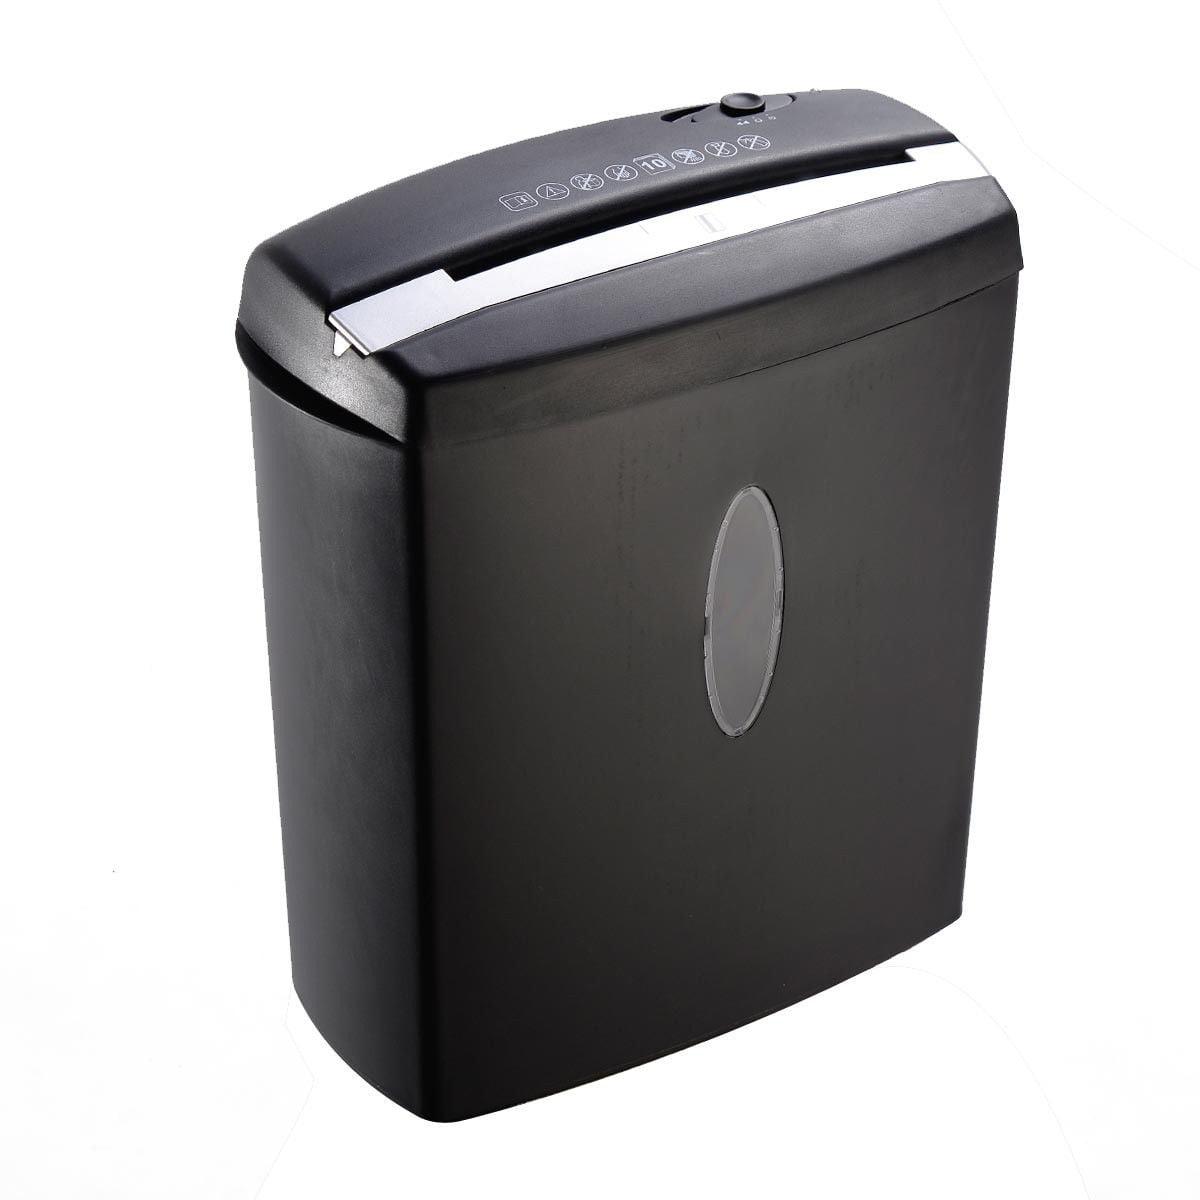 GHP 10-SHeet Capacity Black Cross Cut Paper Shredder w 3.96 Gallon Capacity Wastebin by